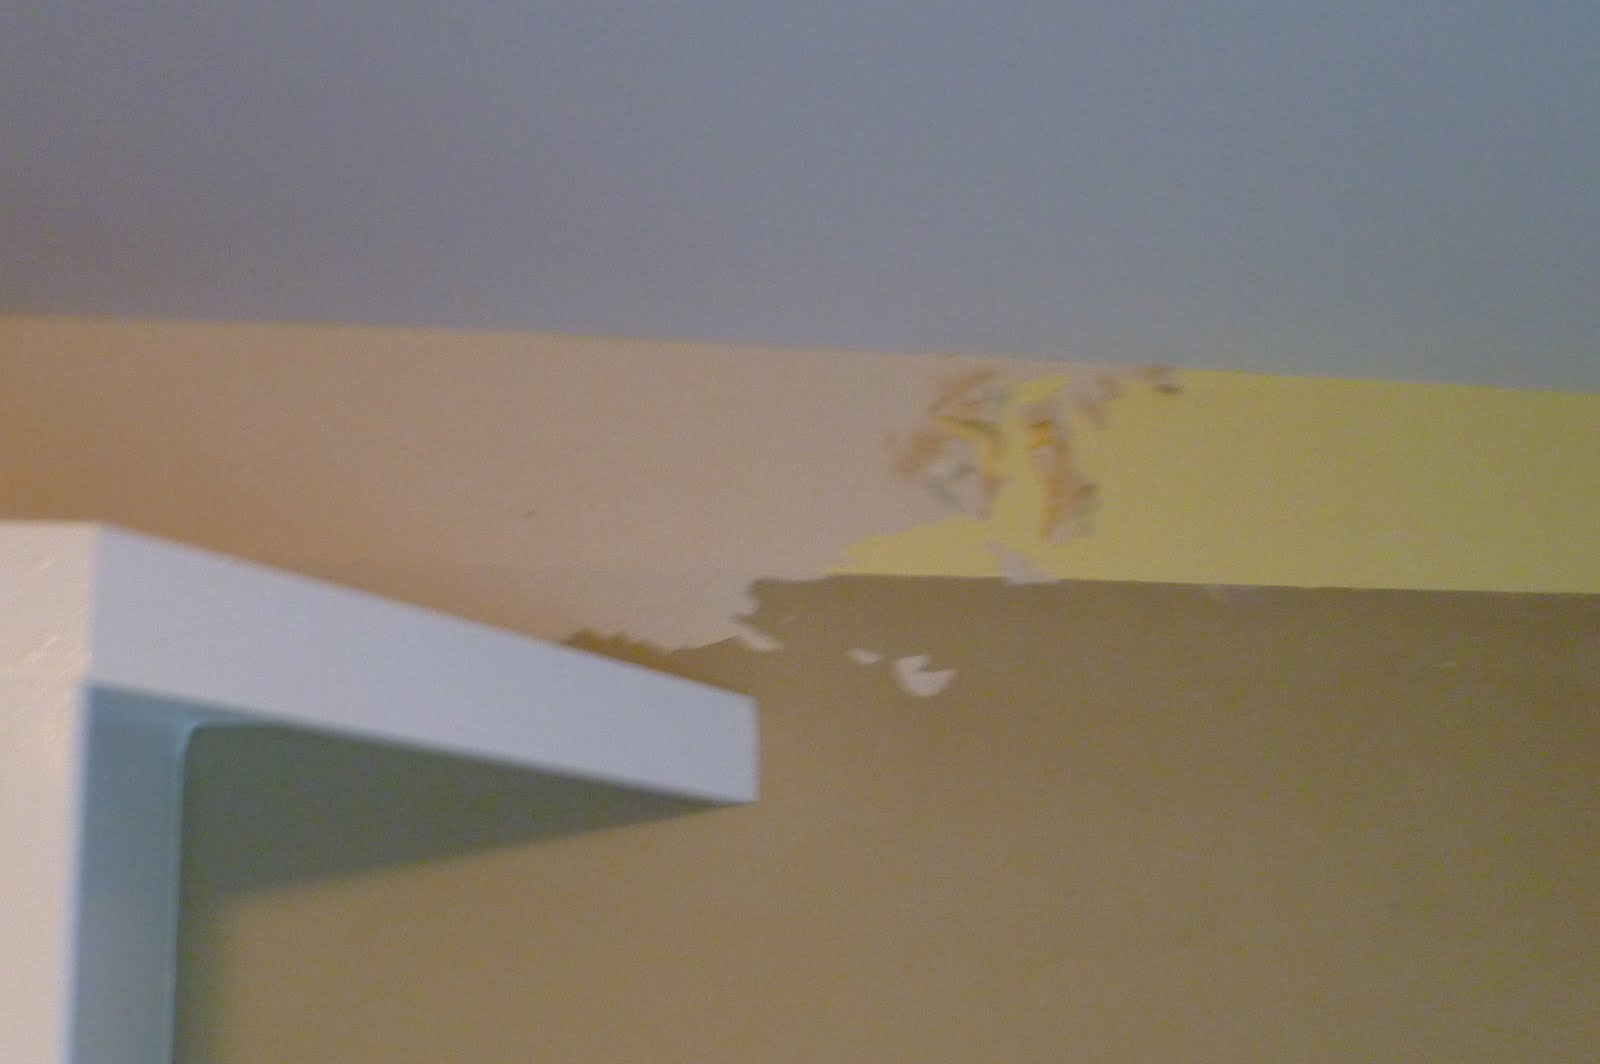 Piranha Wallpaper Remover Spray A Shaver And Special 1600x1064